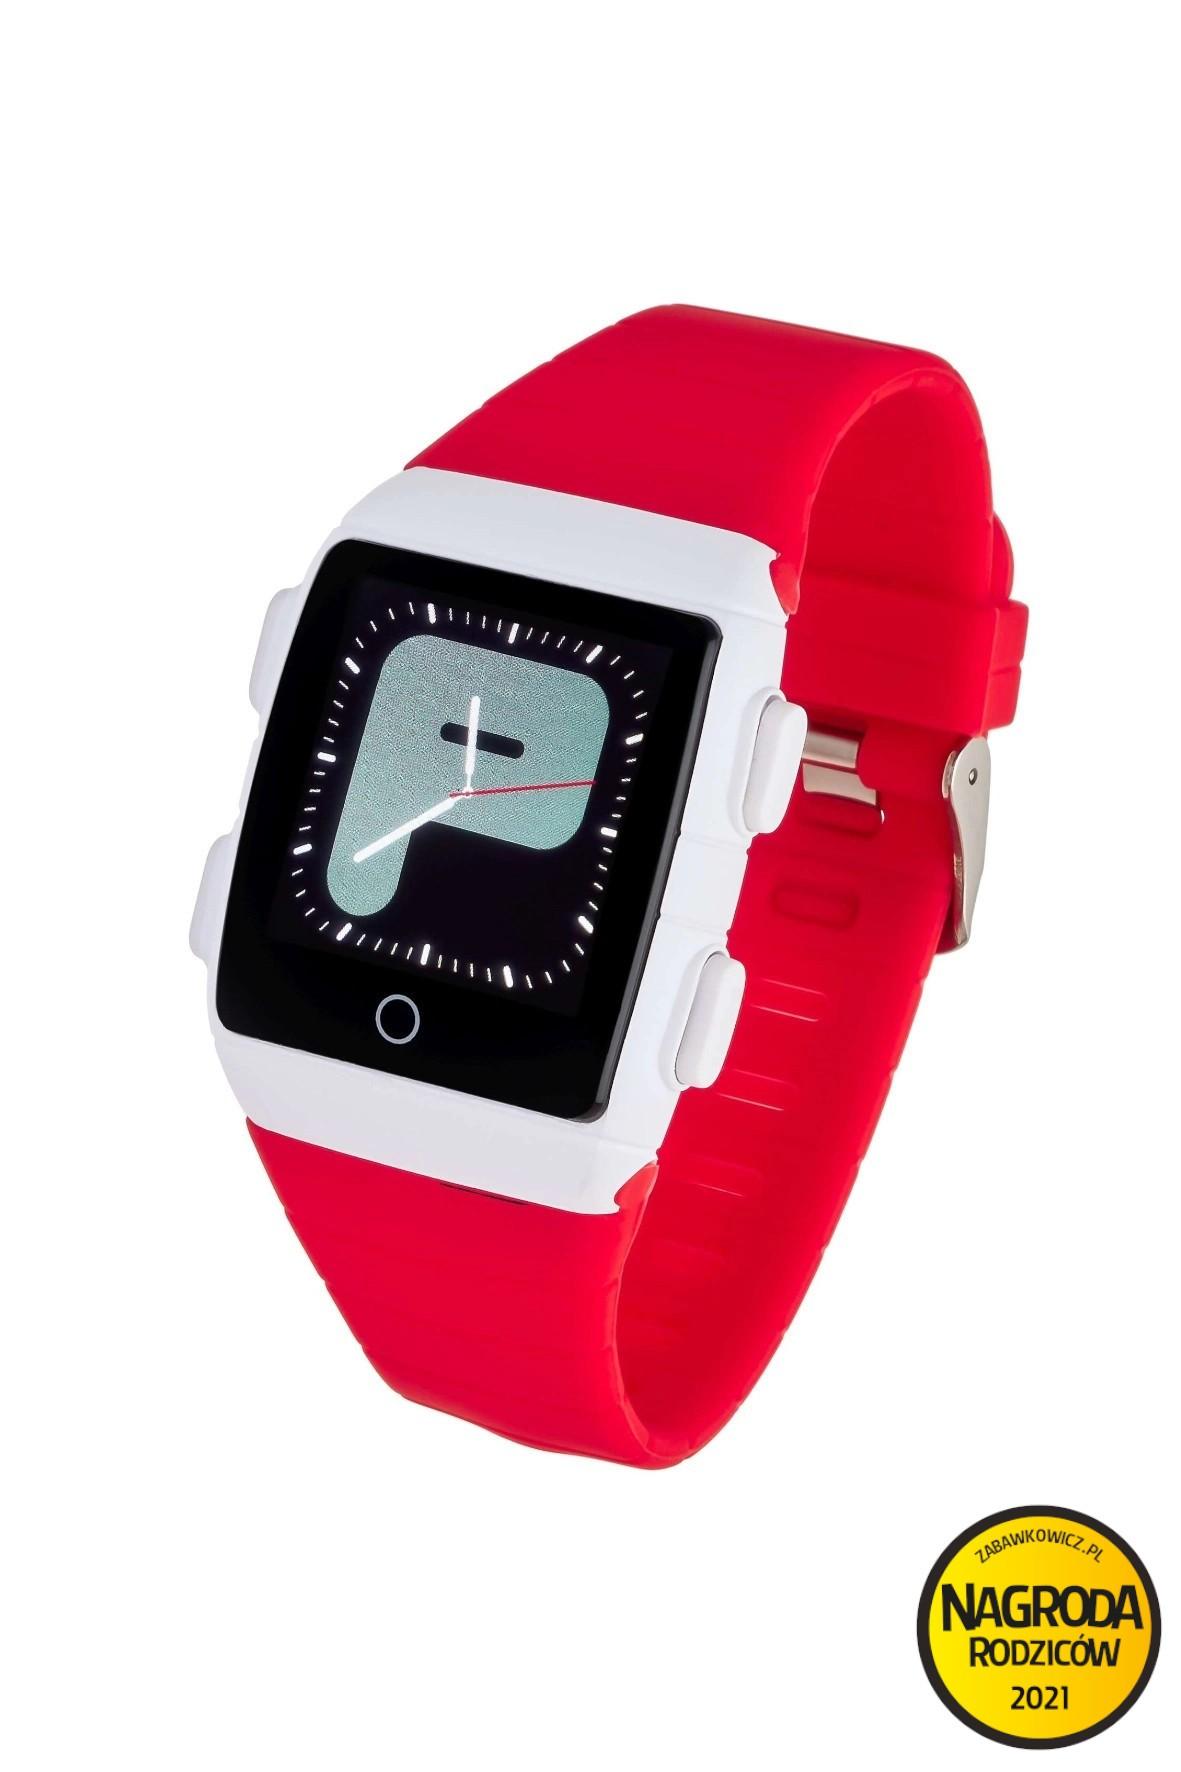 Smartwatch Garett Teen 5 - czerwony